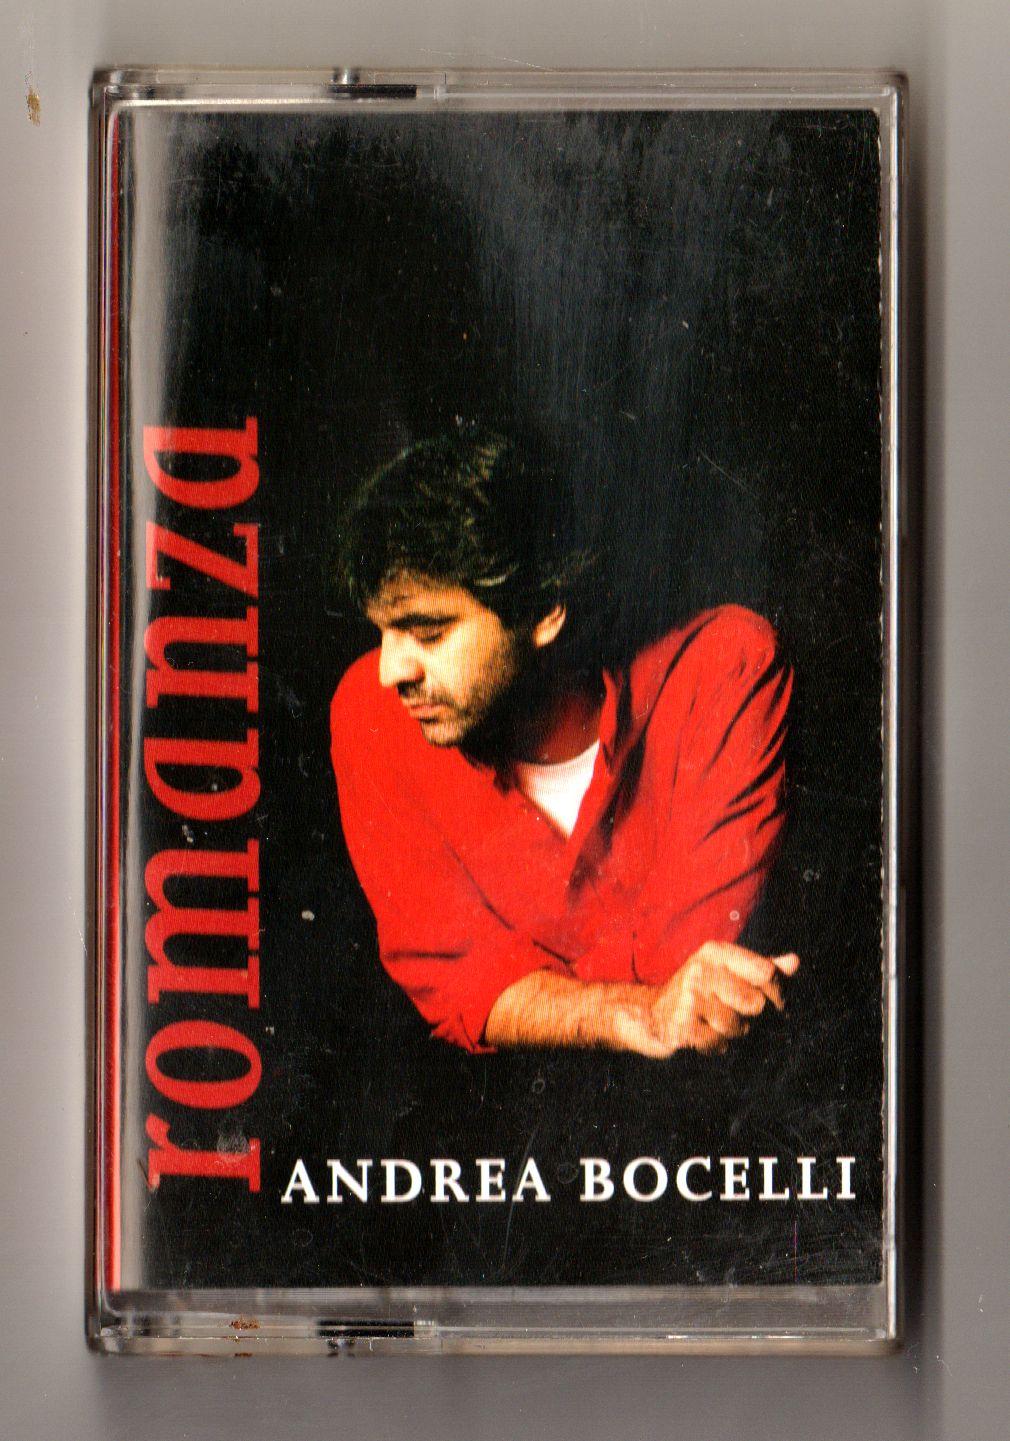 Andrea Bocelli - Romanza (MC kazeta)